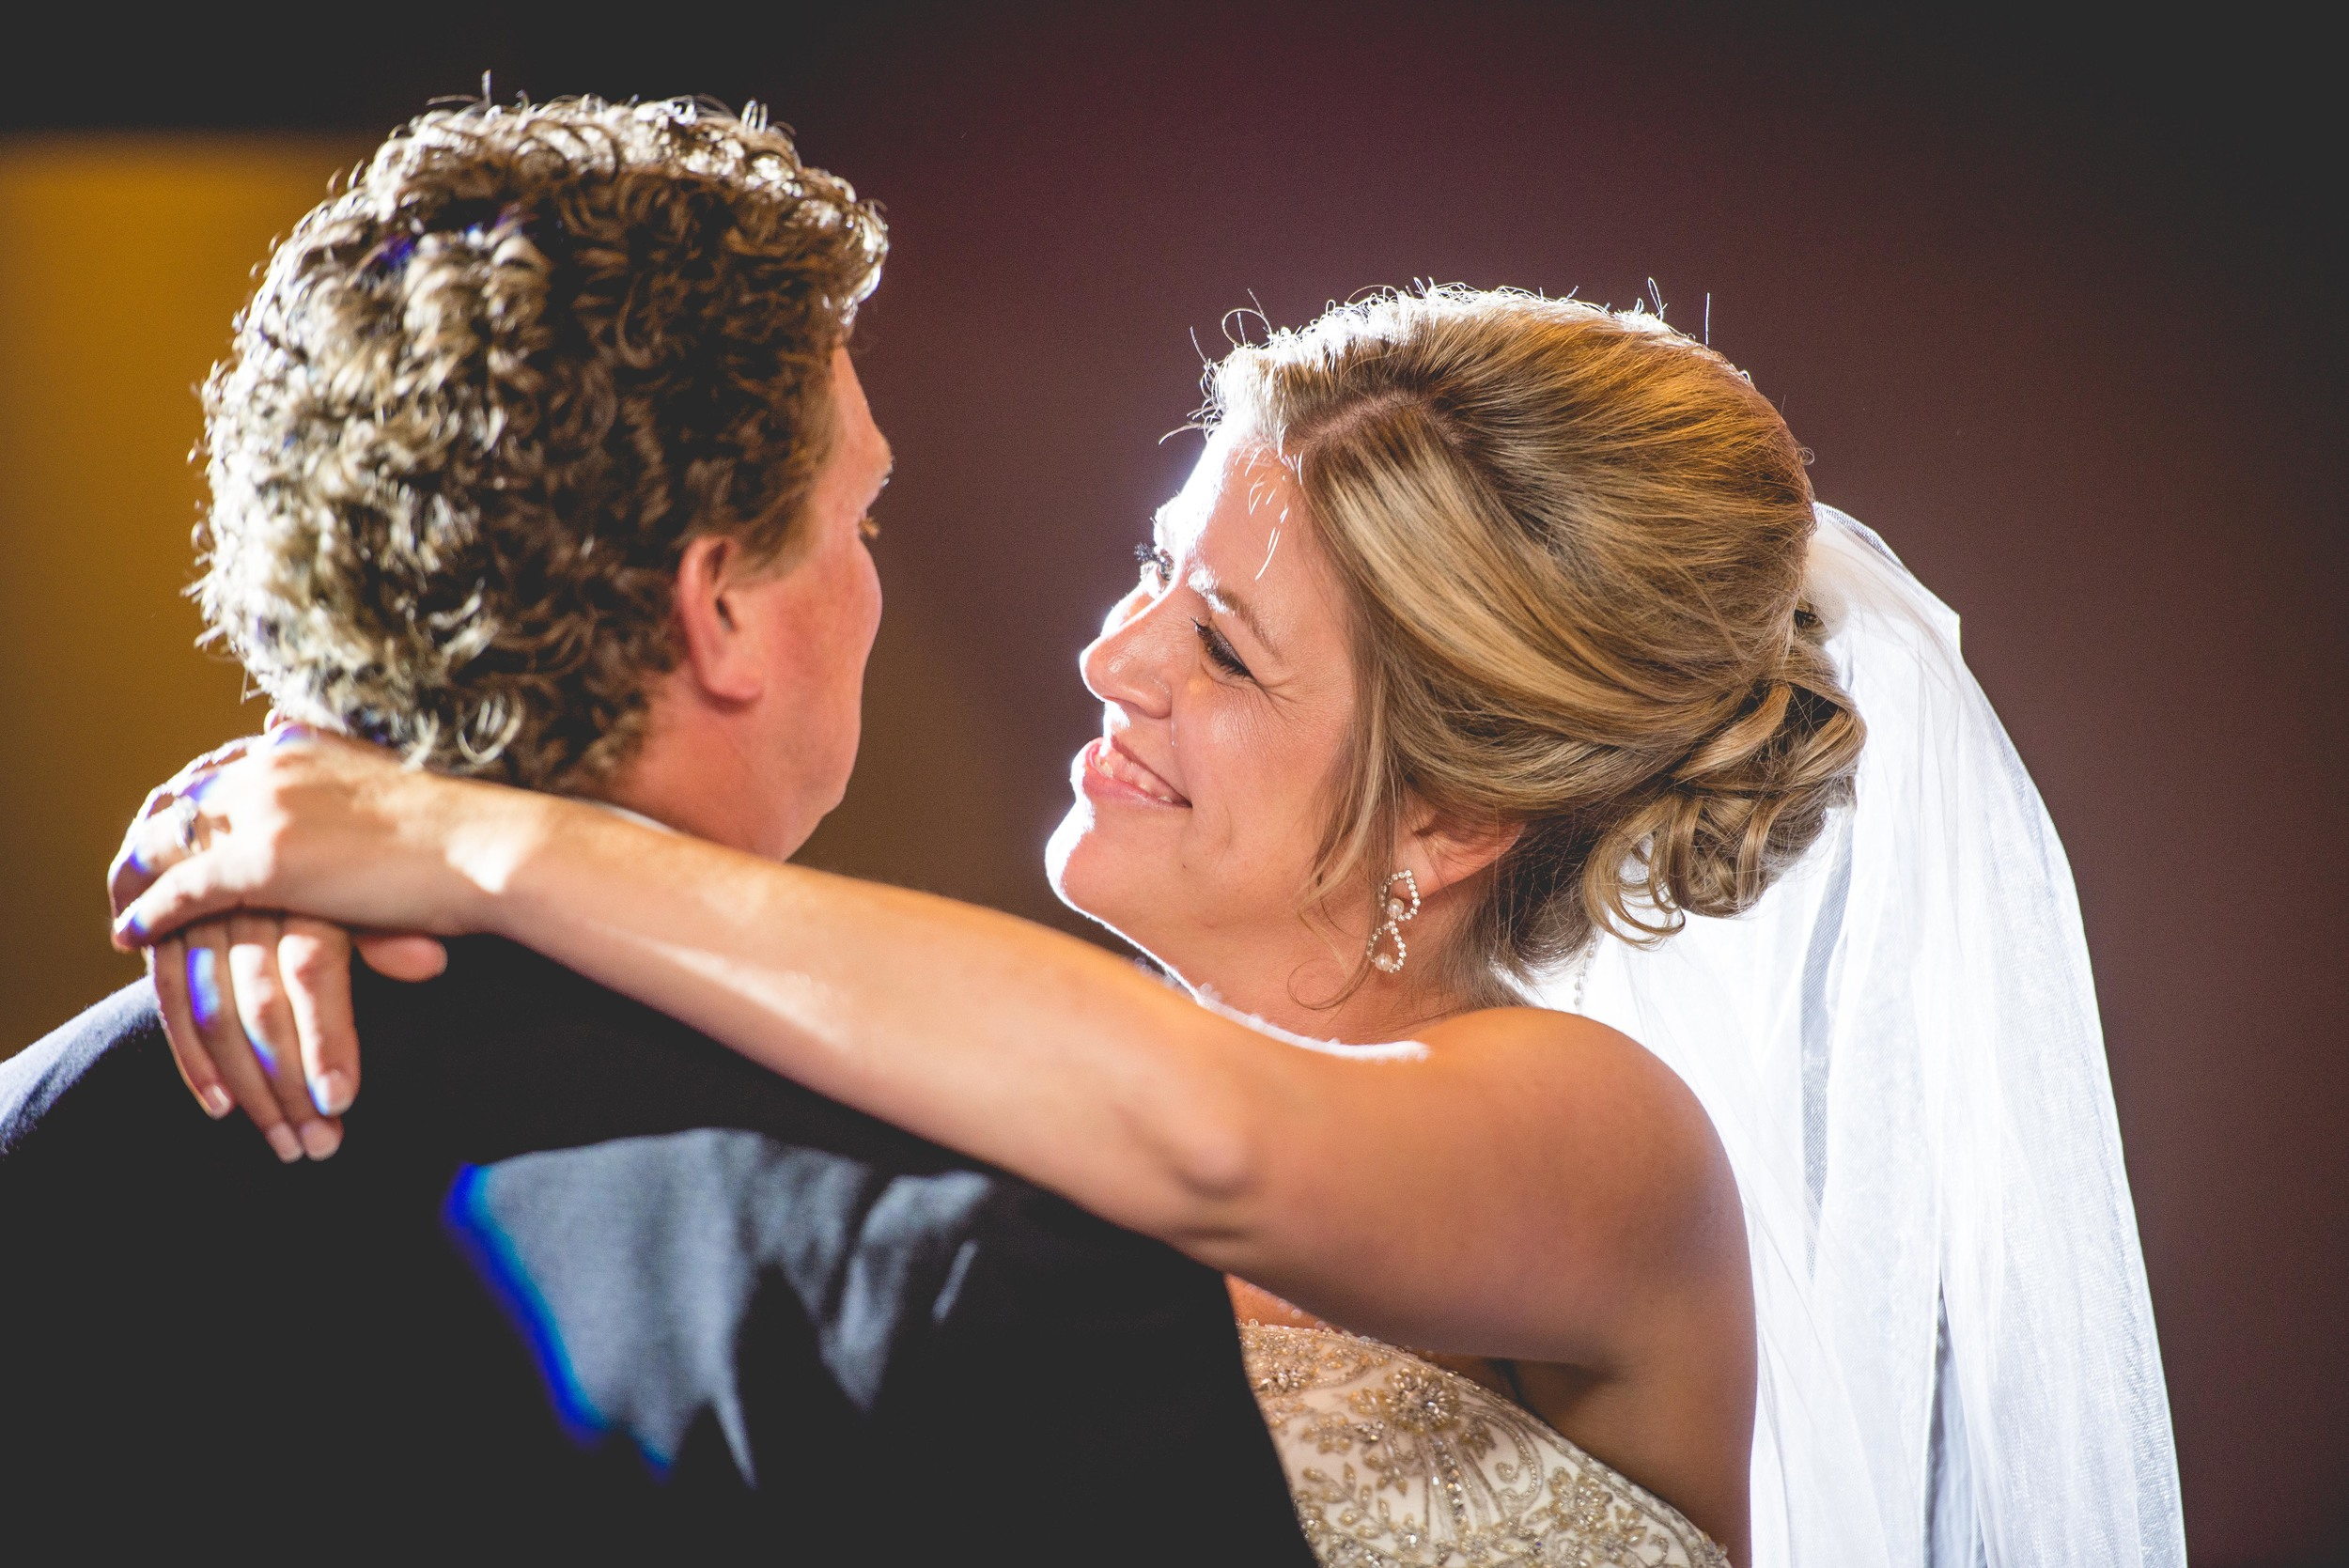 sarasutterphotography_leeandshalon_wedding_2015-696.jpg